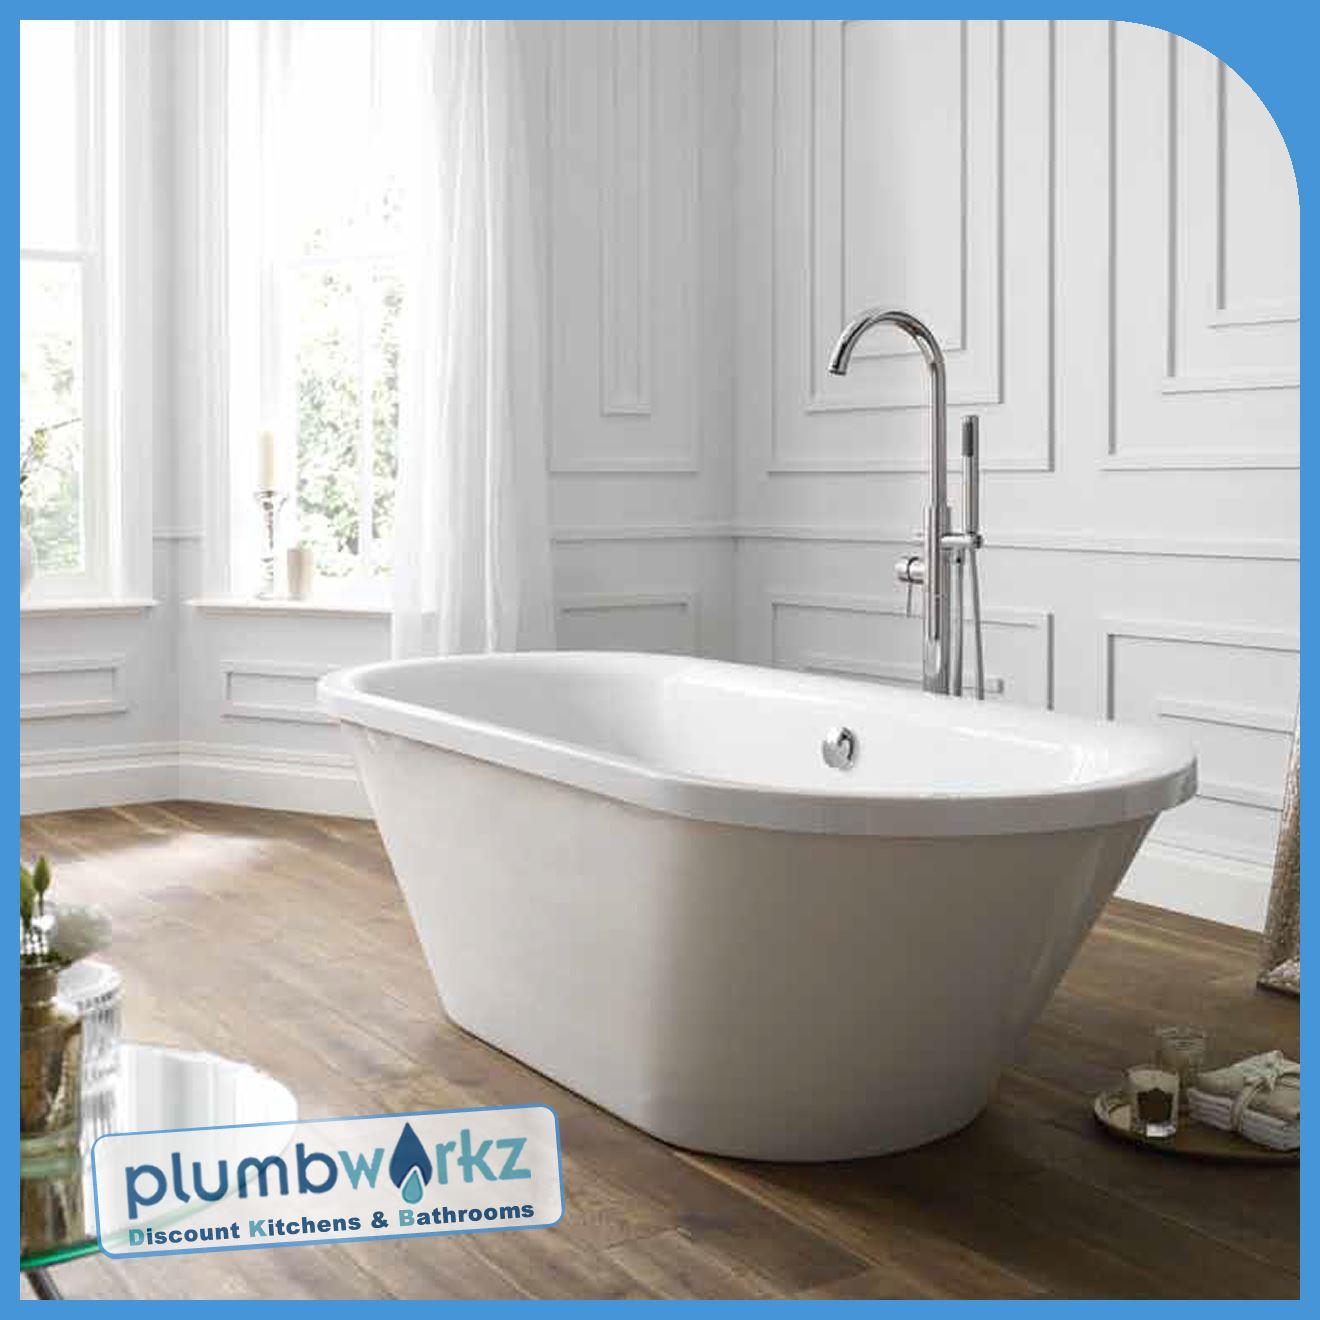 Details about Modern Freestanding Roll Top Designer Baths Bathroom Luxury Bath Tubs